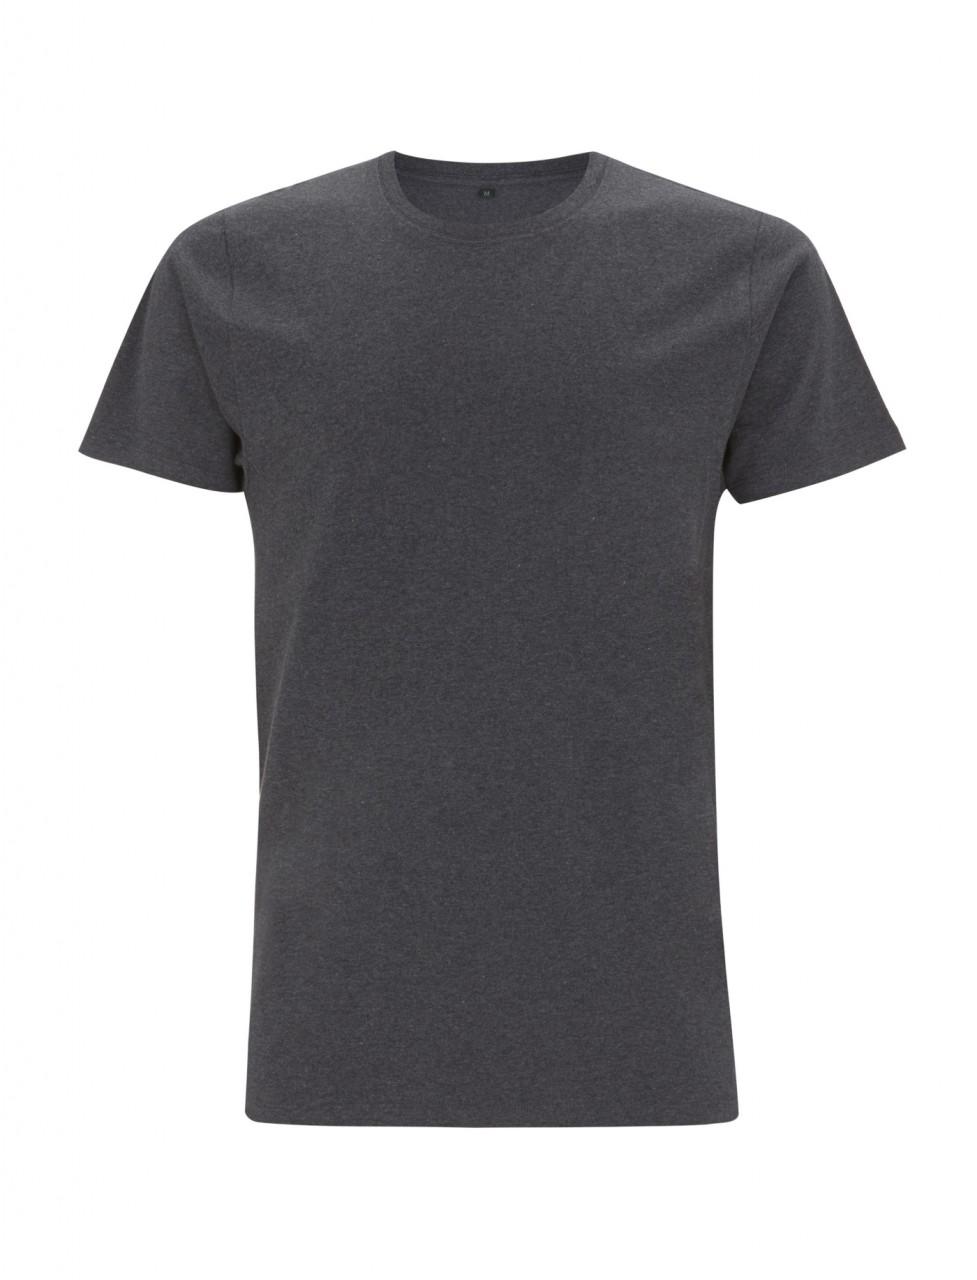 Earth Positive Unisex T-Shirt Melange black